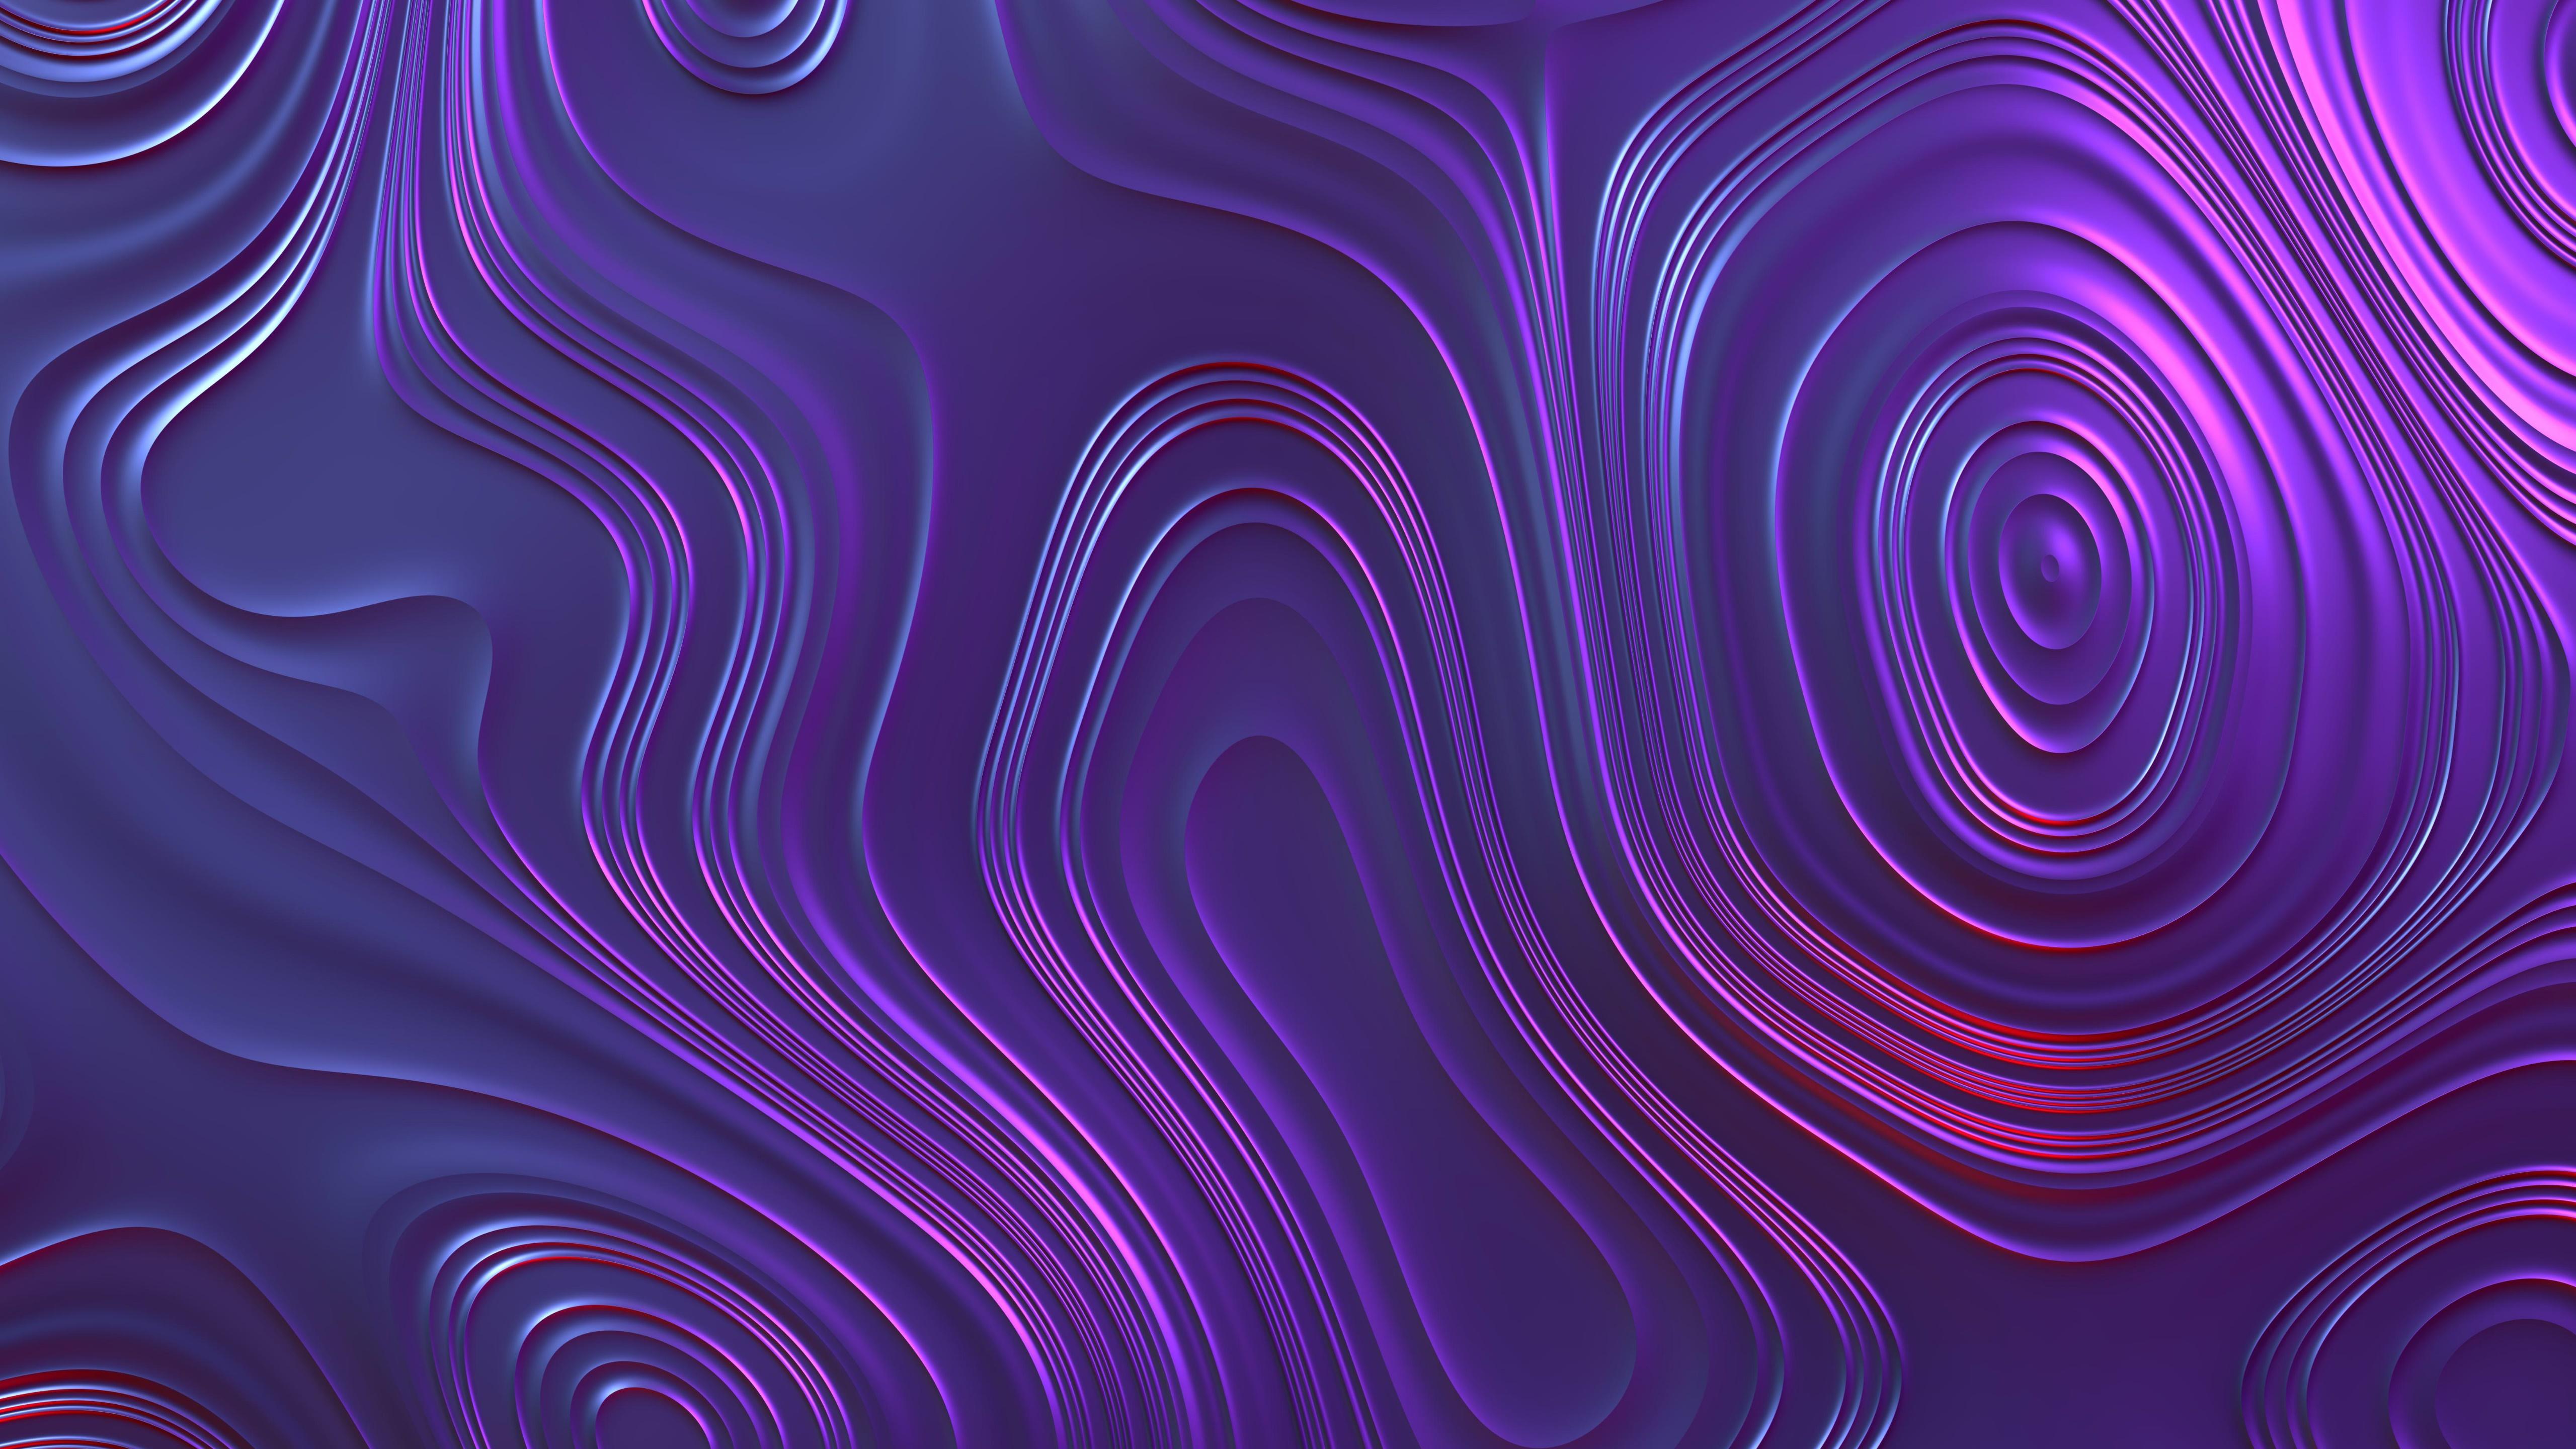 Shiny purple abstract art wallpaper